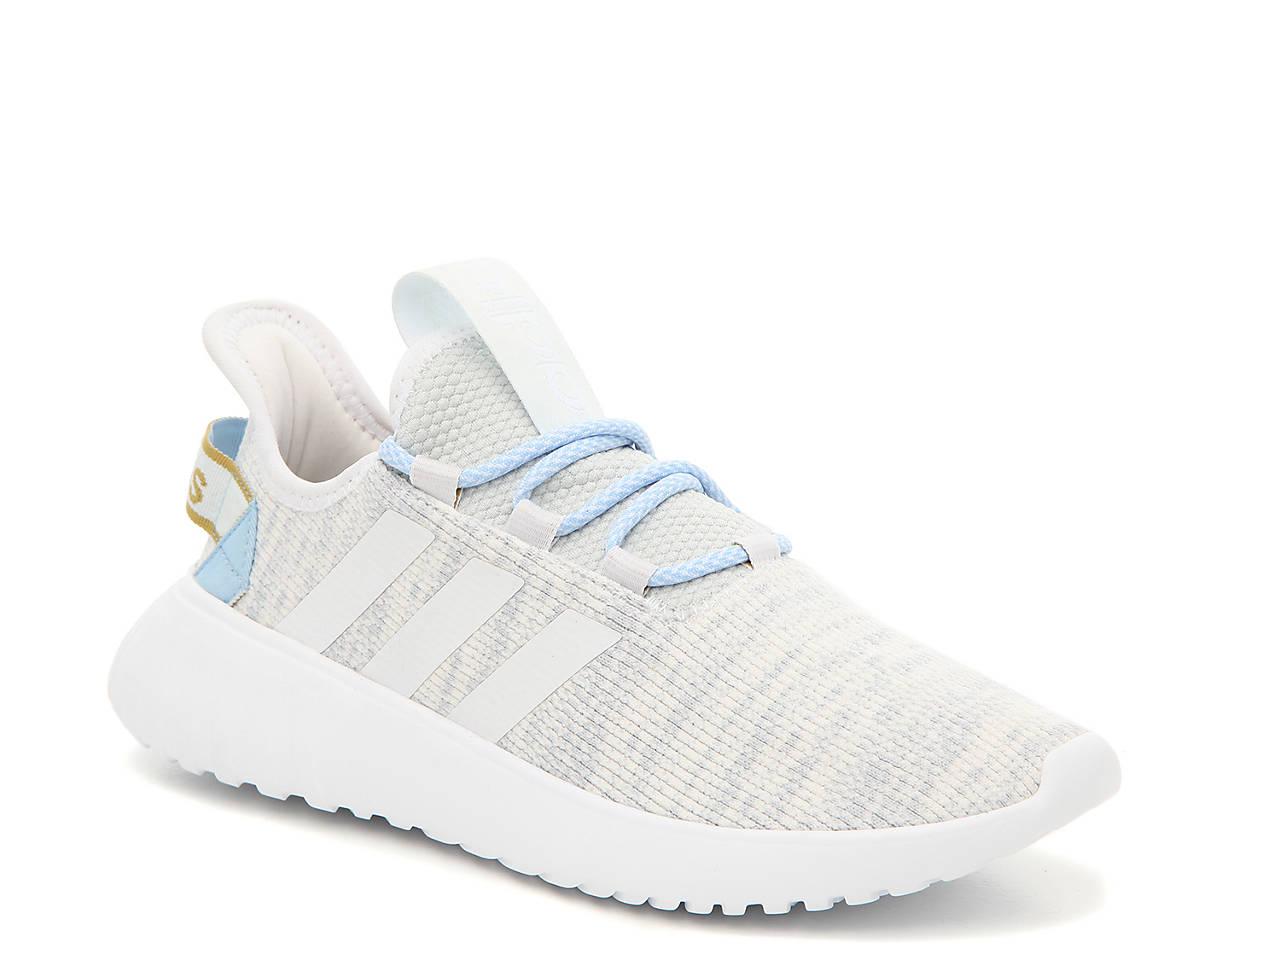 Kaptir X Sneaker Women's